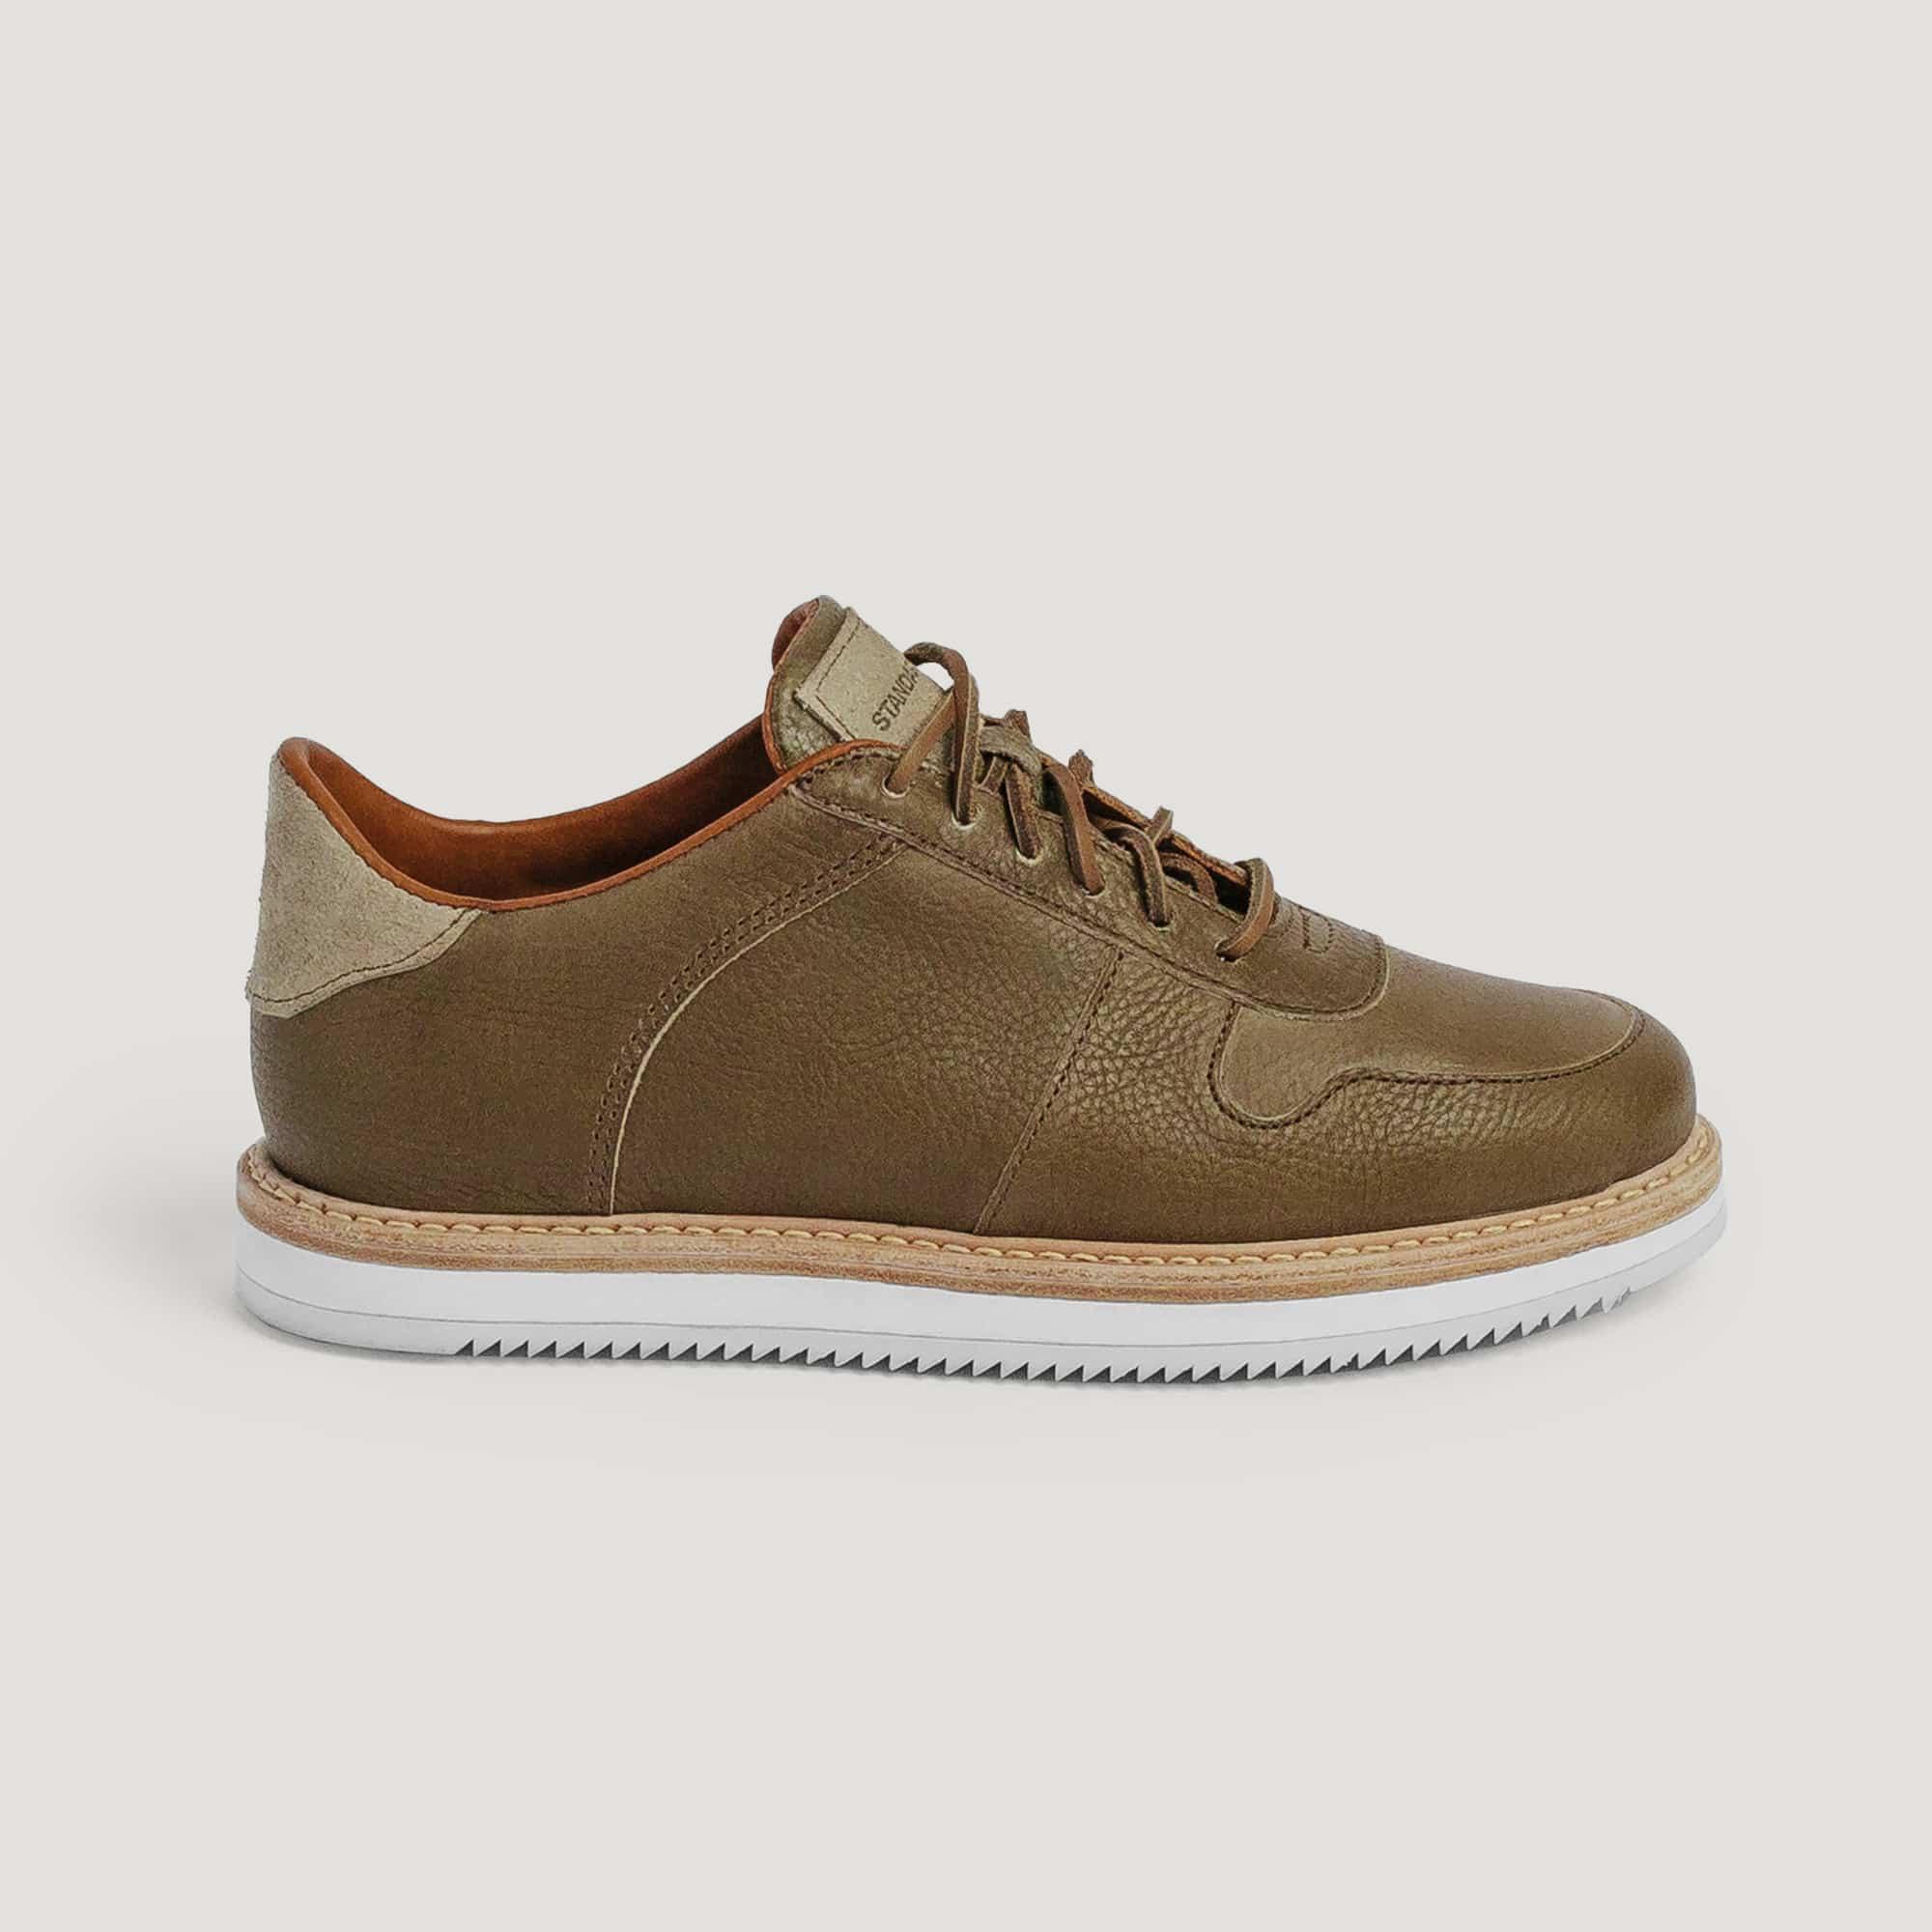 standard-fair-sneakers-sport-ripple-soles